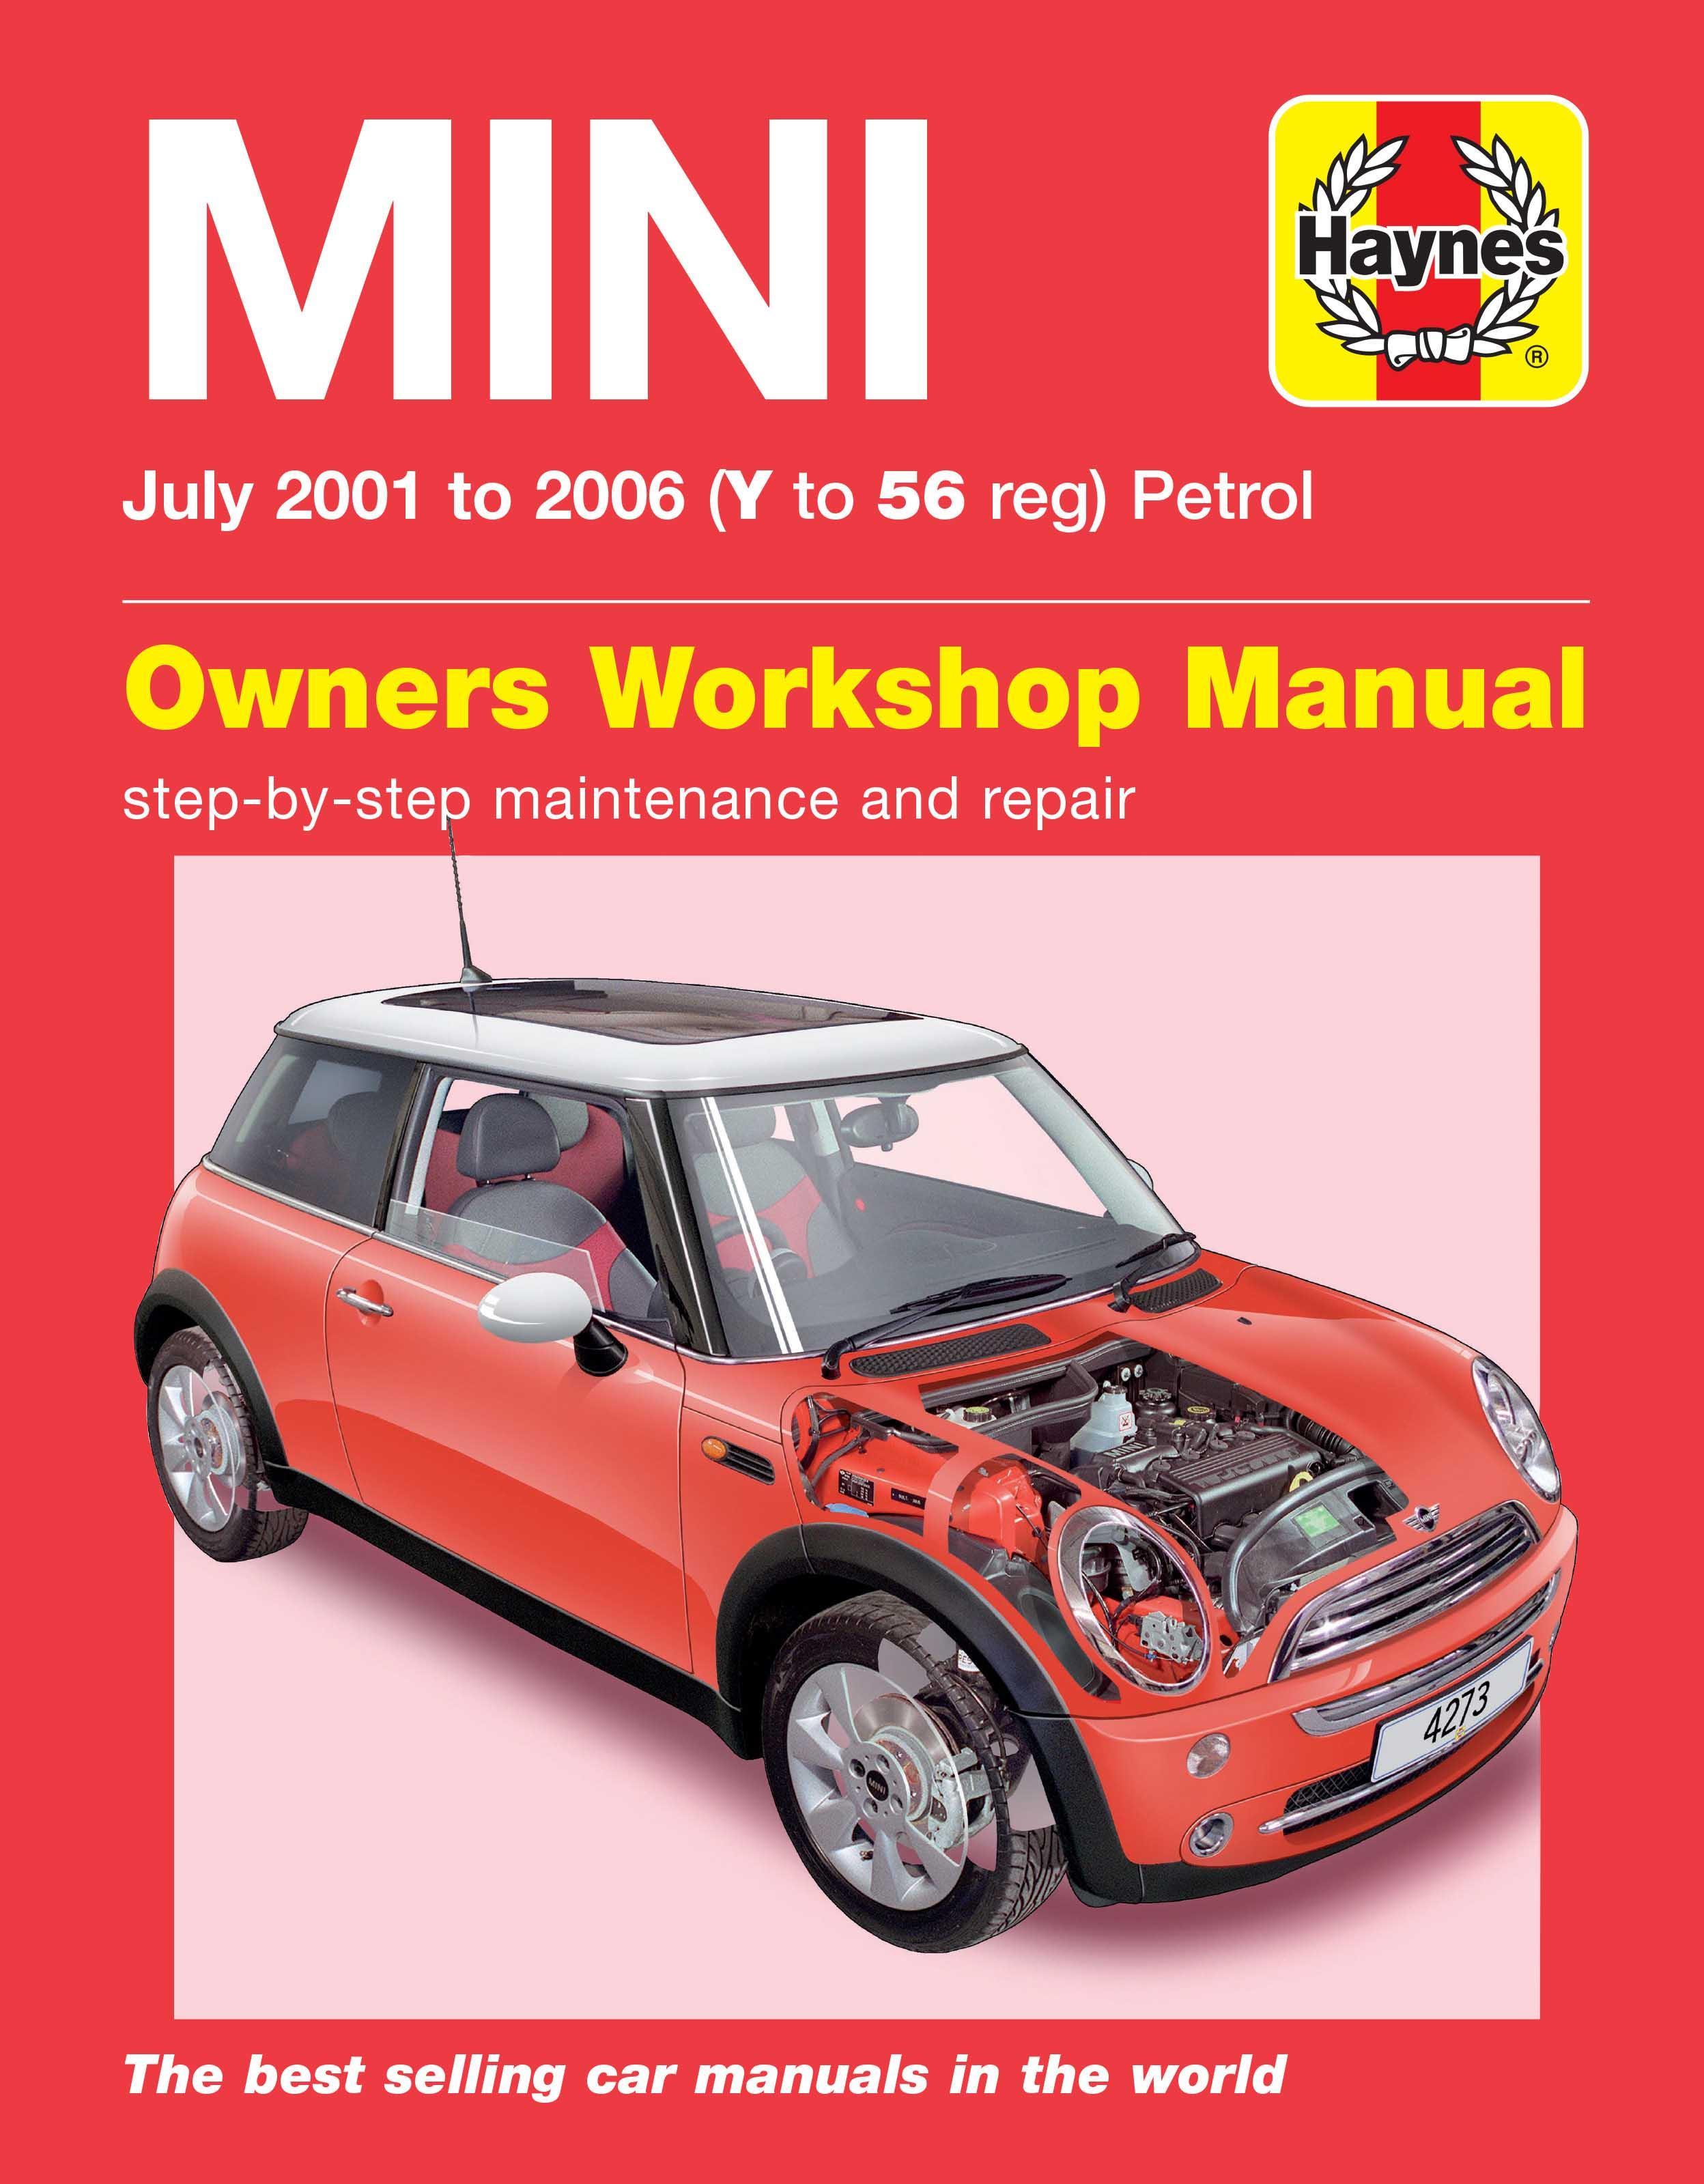 haynes bmw mini 01 05 manual 2004 mini cooper radio wiring diagram as well as balancing chemical [ 840 x 1100 Pixel ]